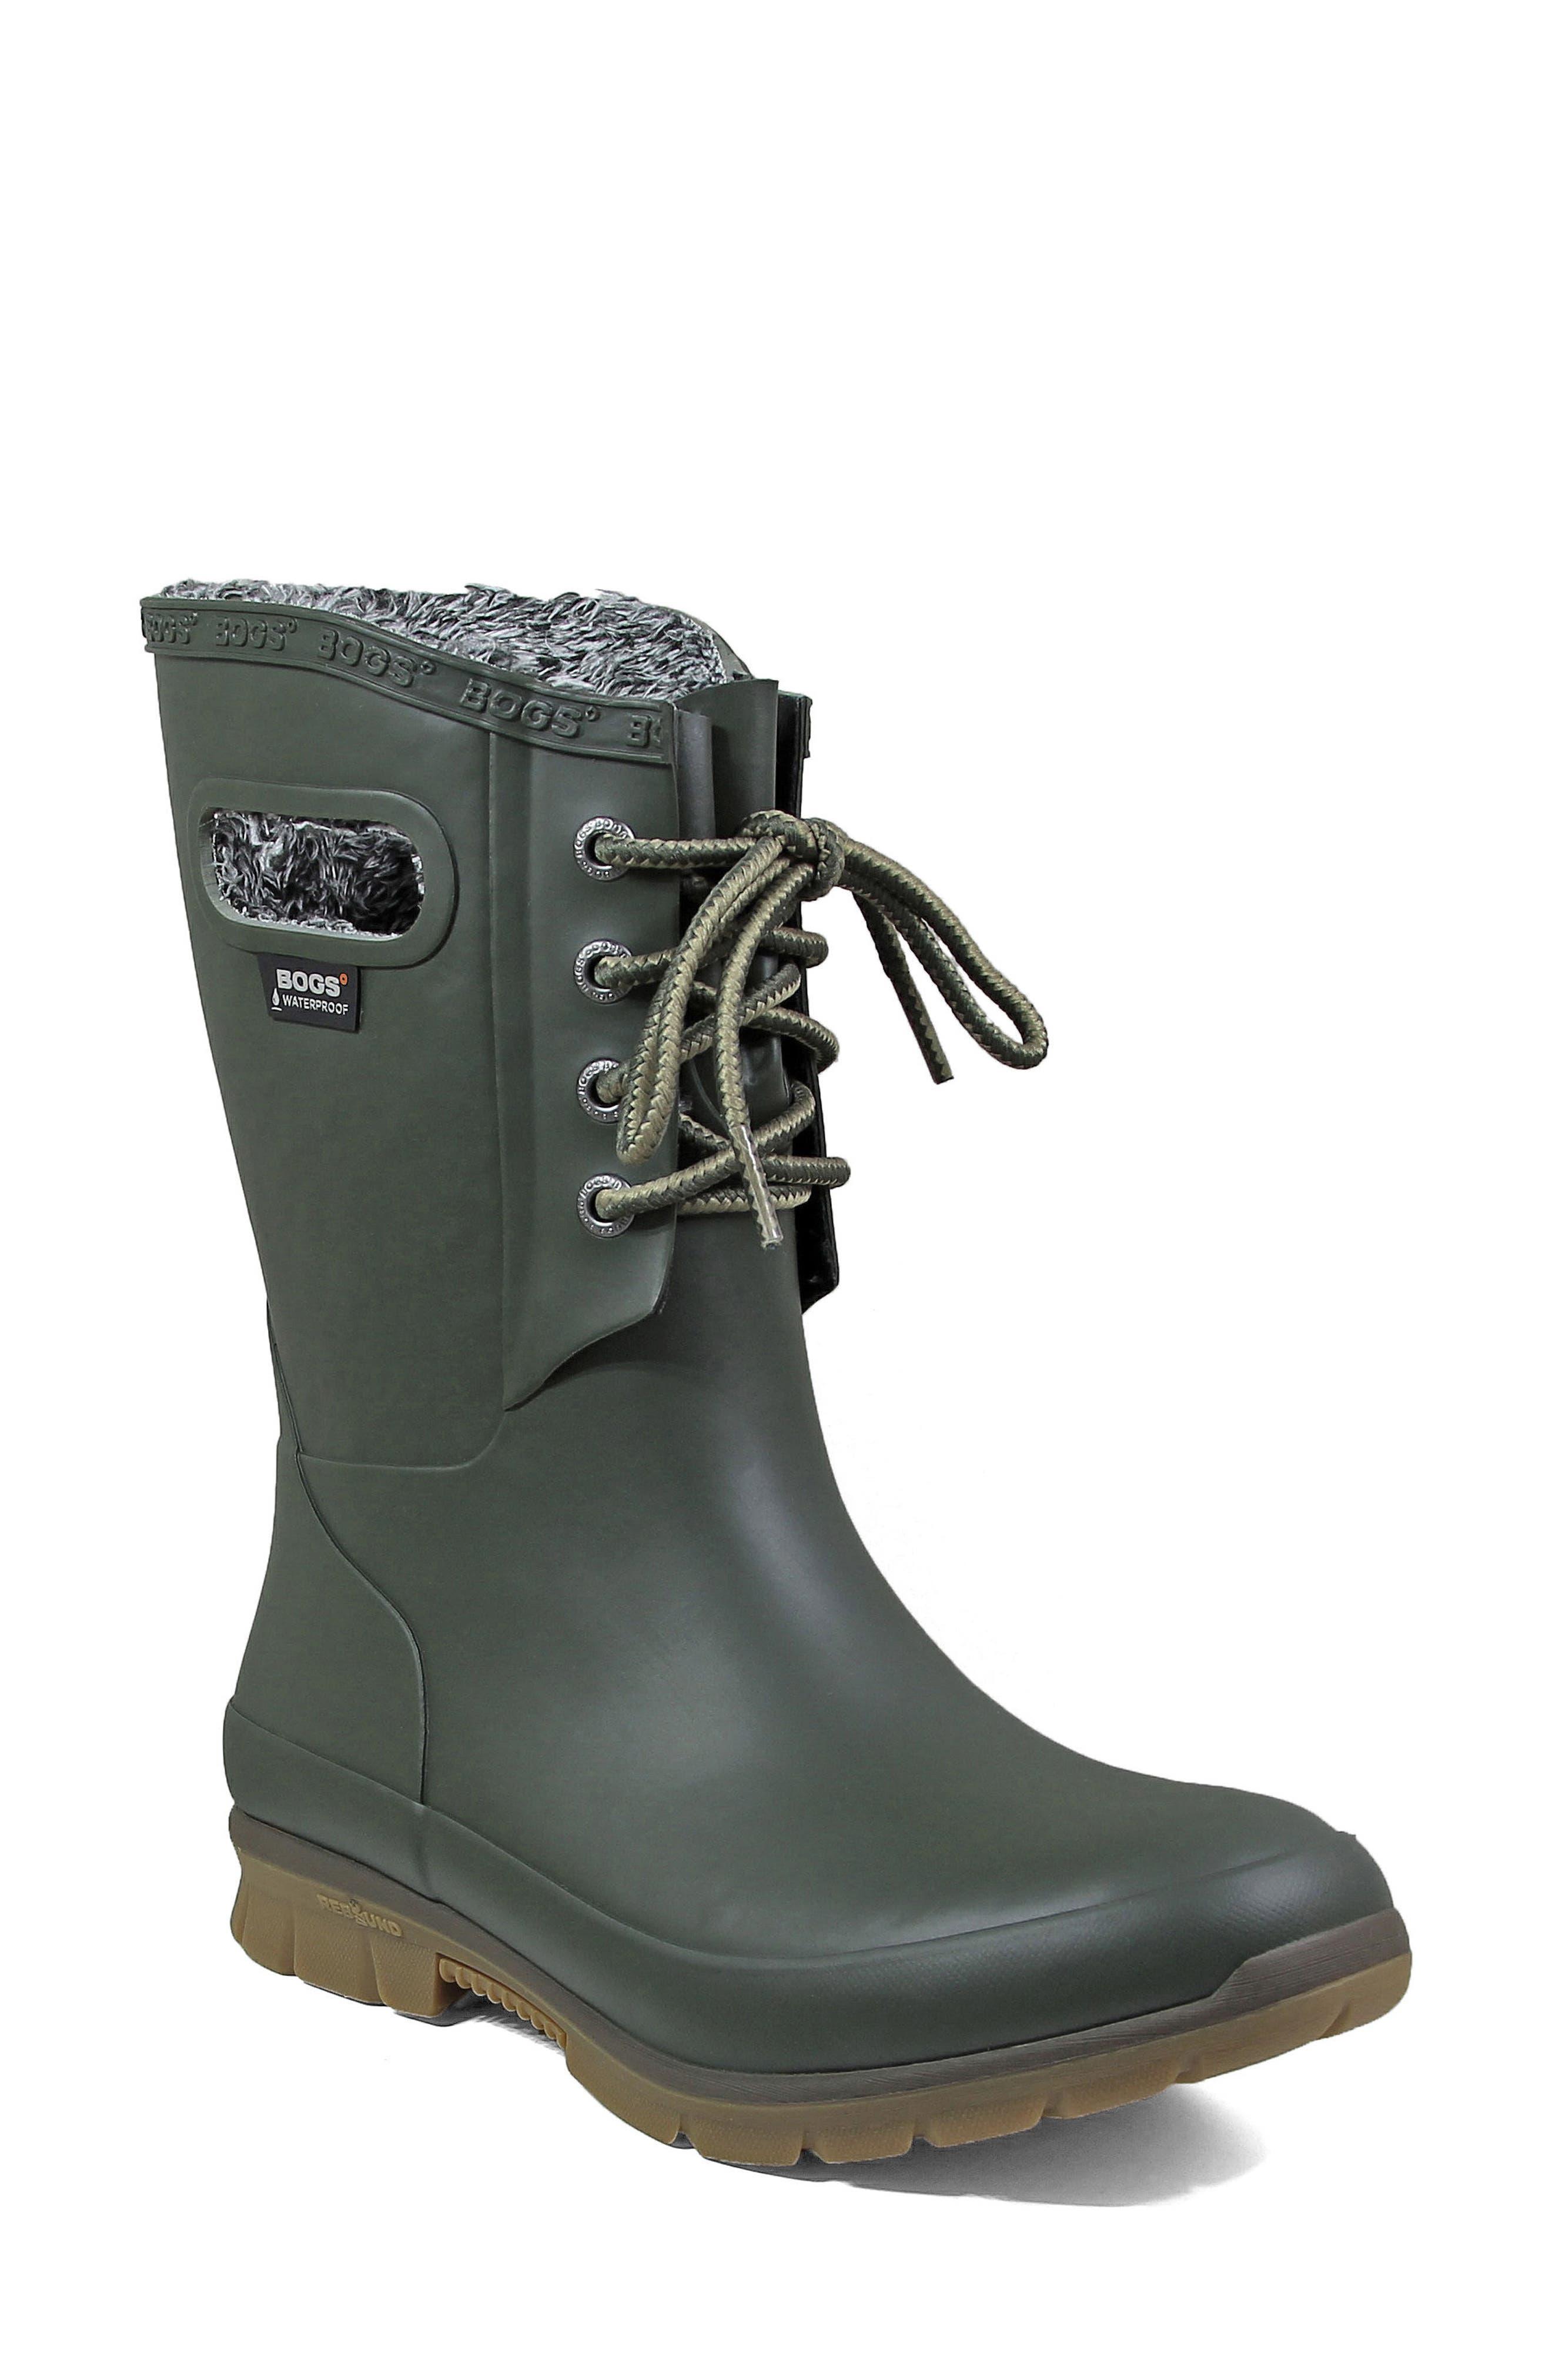 Bogs Amanda Plush Waterproof Rain Boot, Green